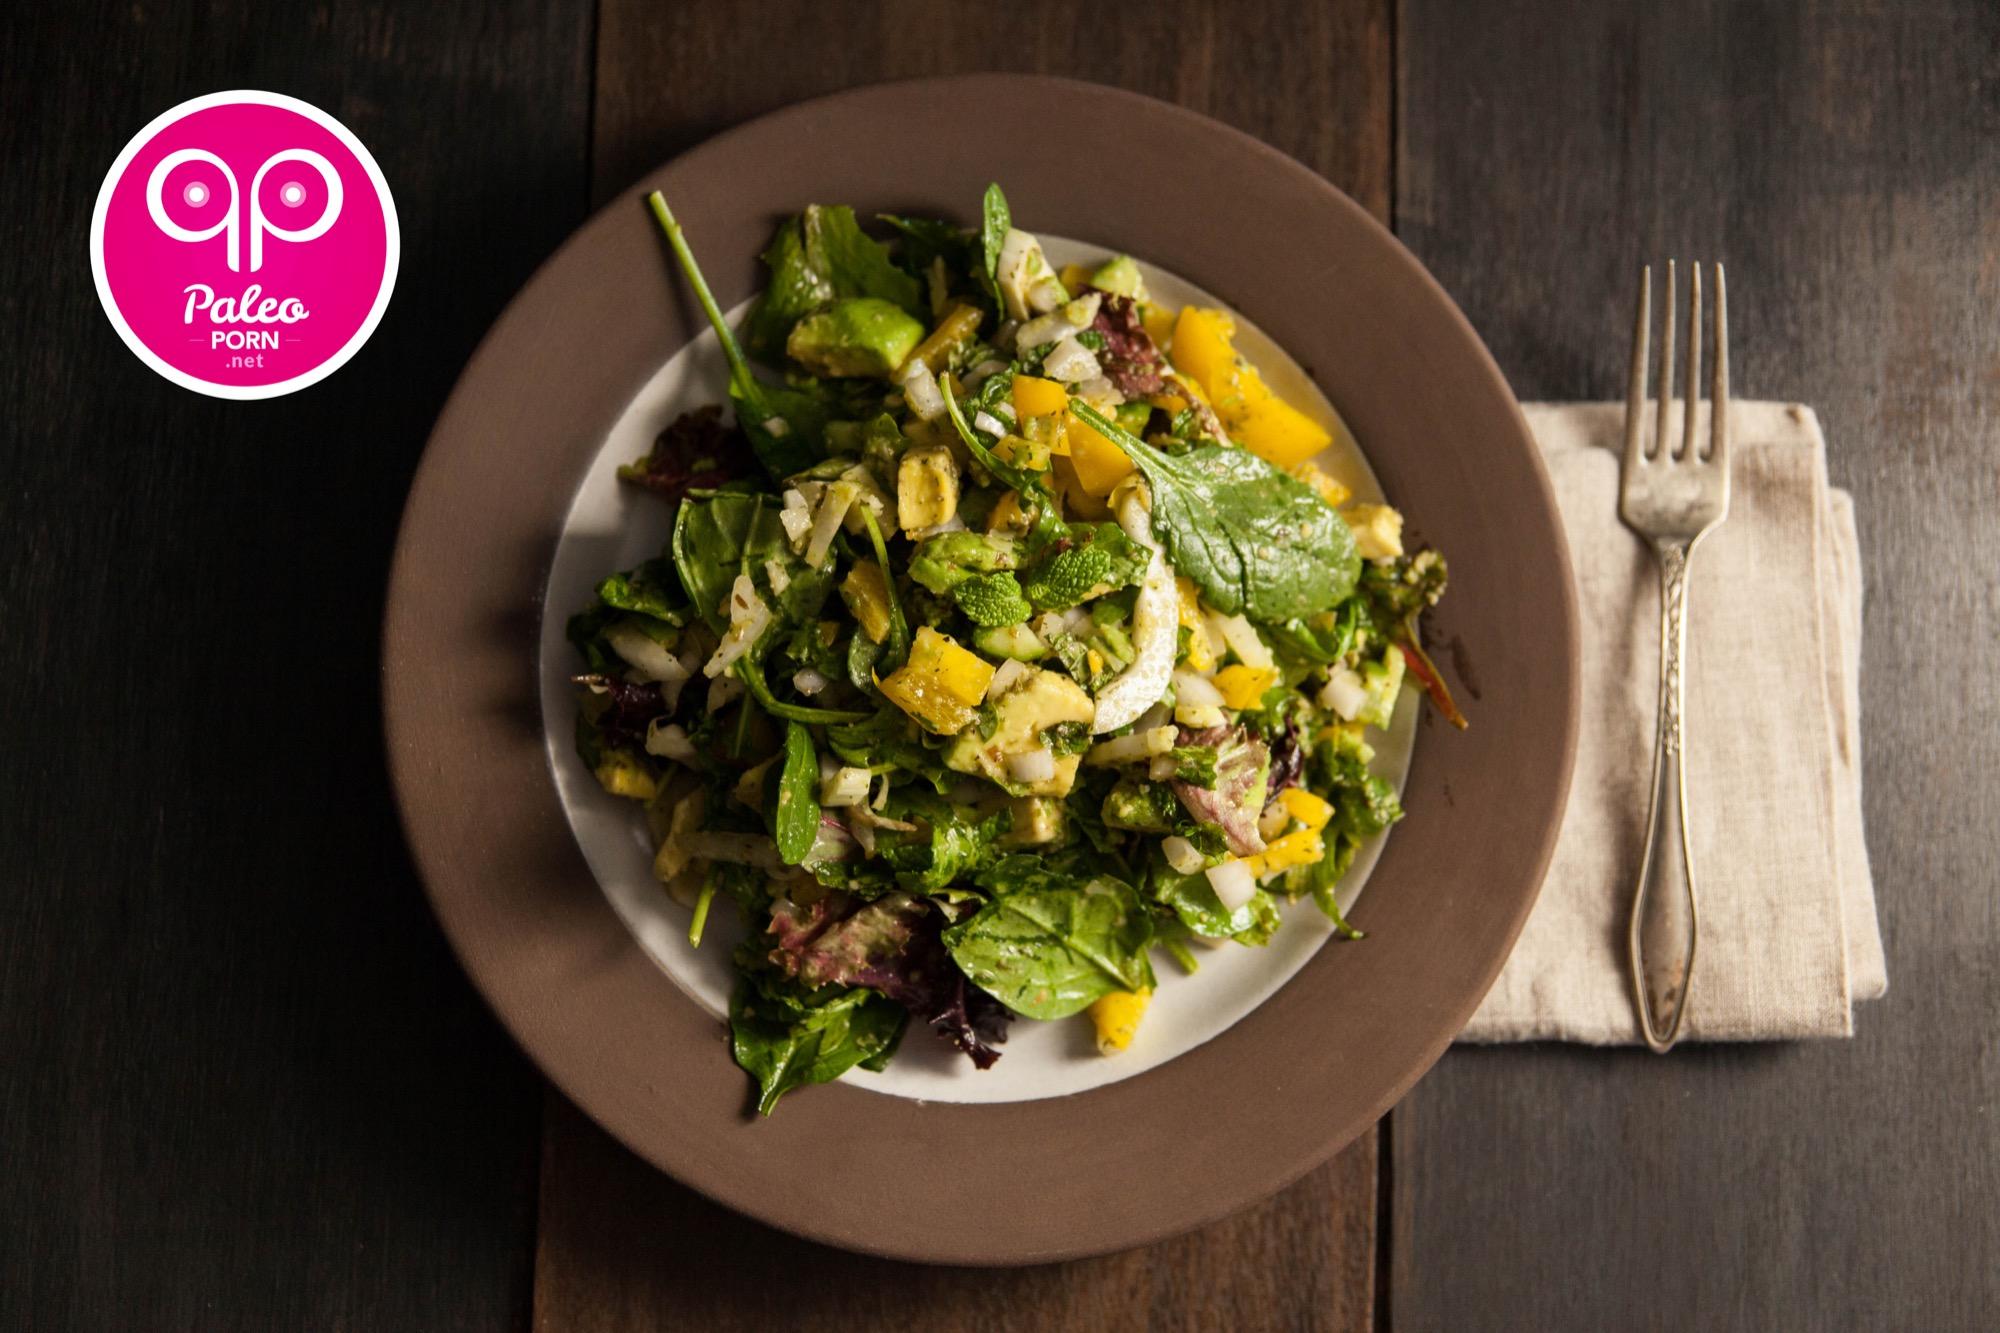 Baby Kale Rocket Salad With Fennel Paleo Porn Steamy Paleo Recipes